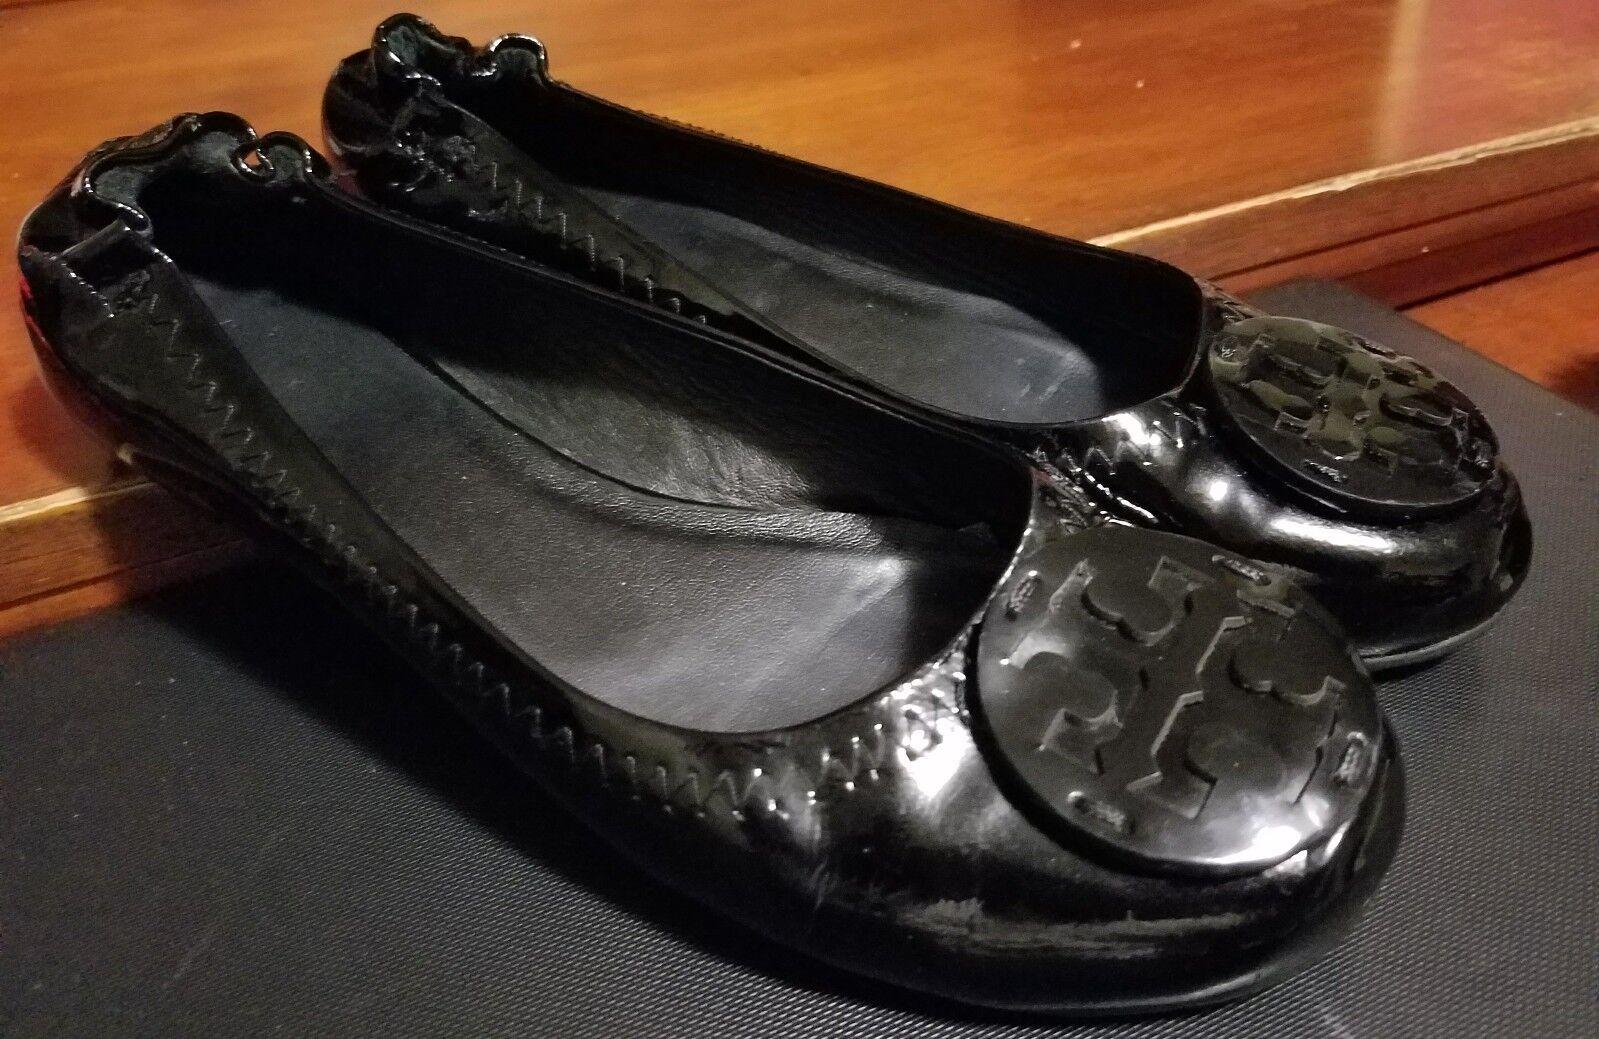 Tory Burch BIG Nero Patent Leather Ballerina Flats Size 7 BIG Burch CREST LOGO NICE 7bbdd0